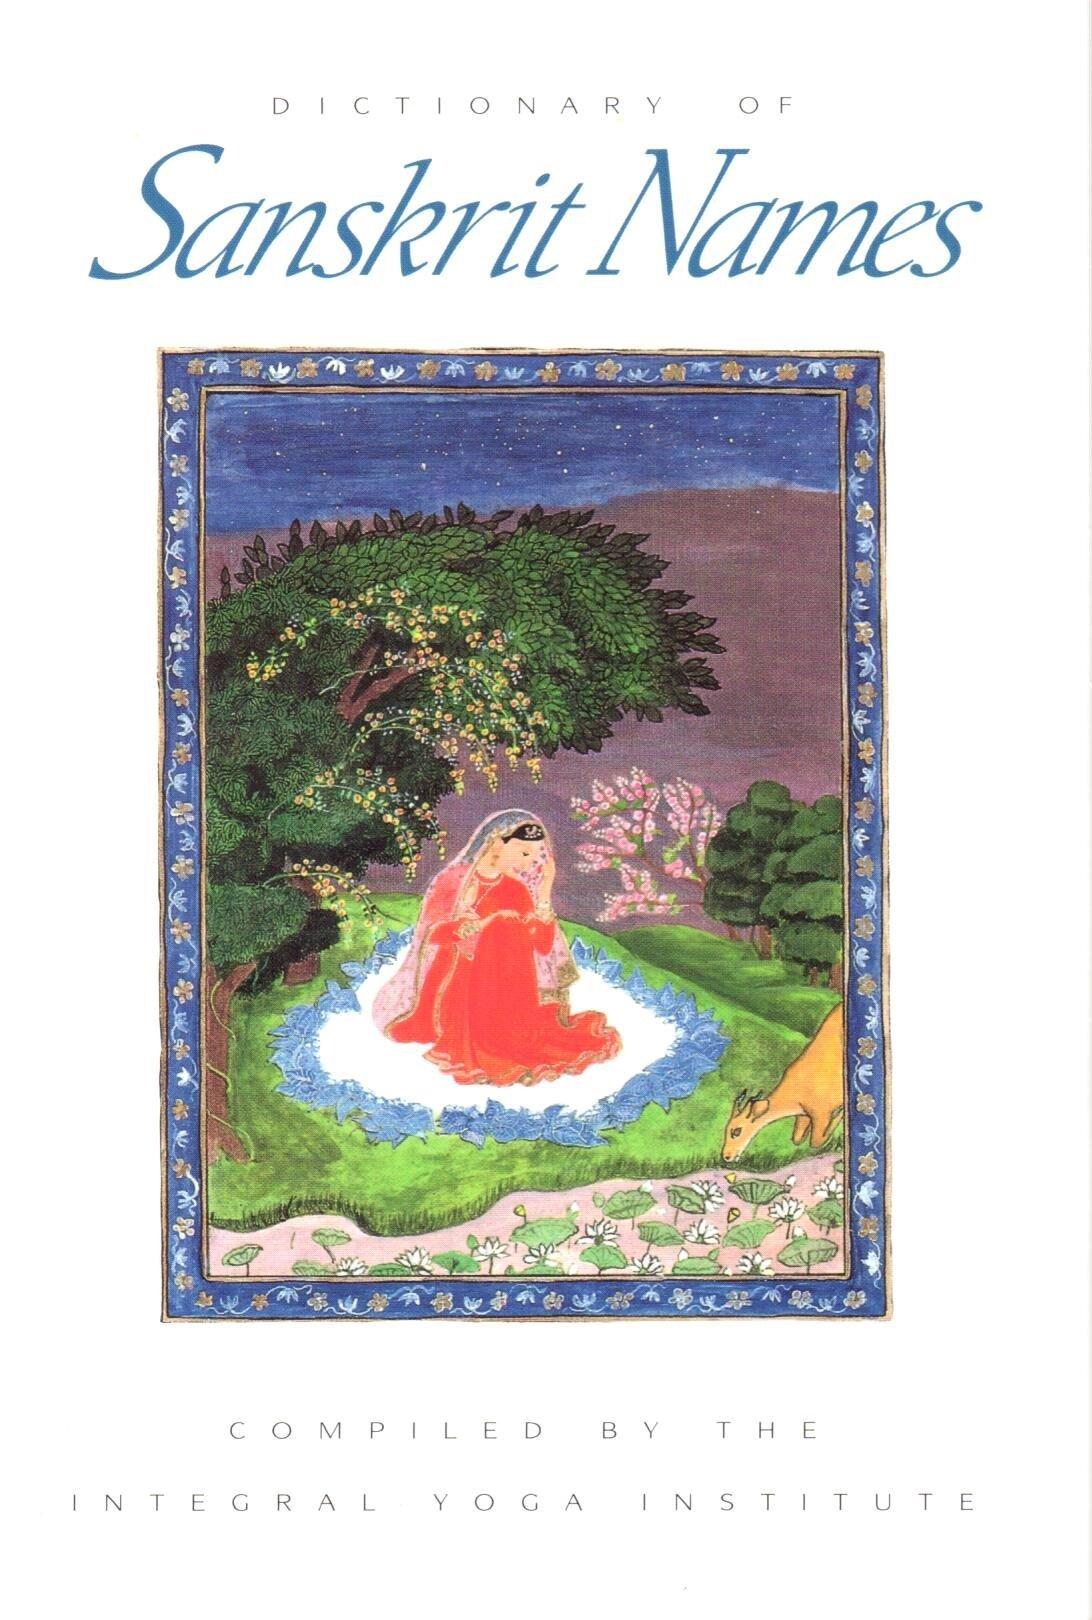 Dictionary Of Sanskrit Names Integral Yoga Institute 9780932040350 Amazon Com Books